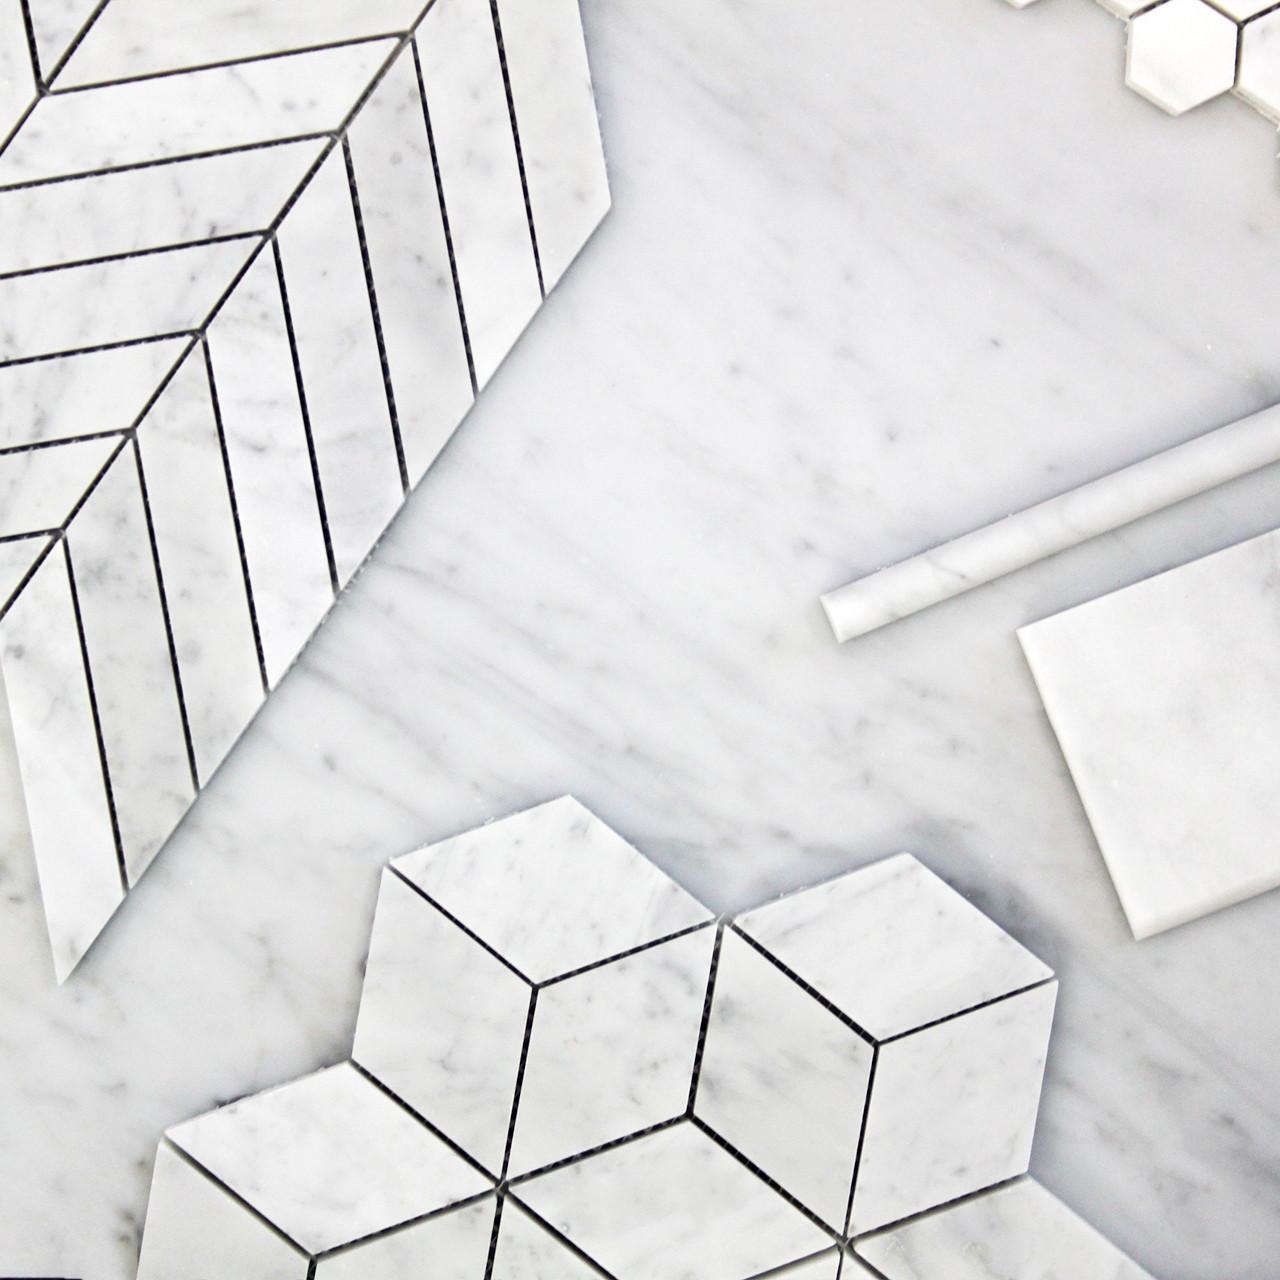 carrara white italian marble 1 x 4 chevron mosaic tile honed